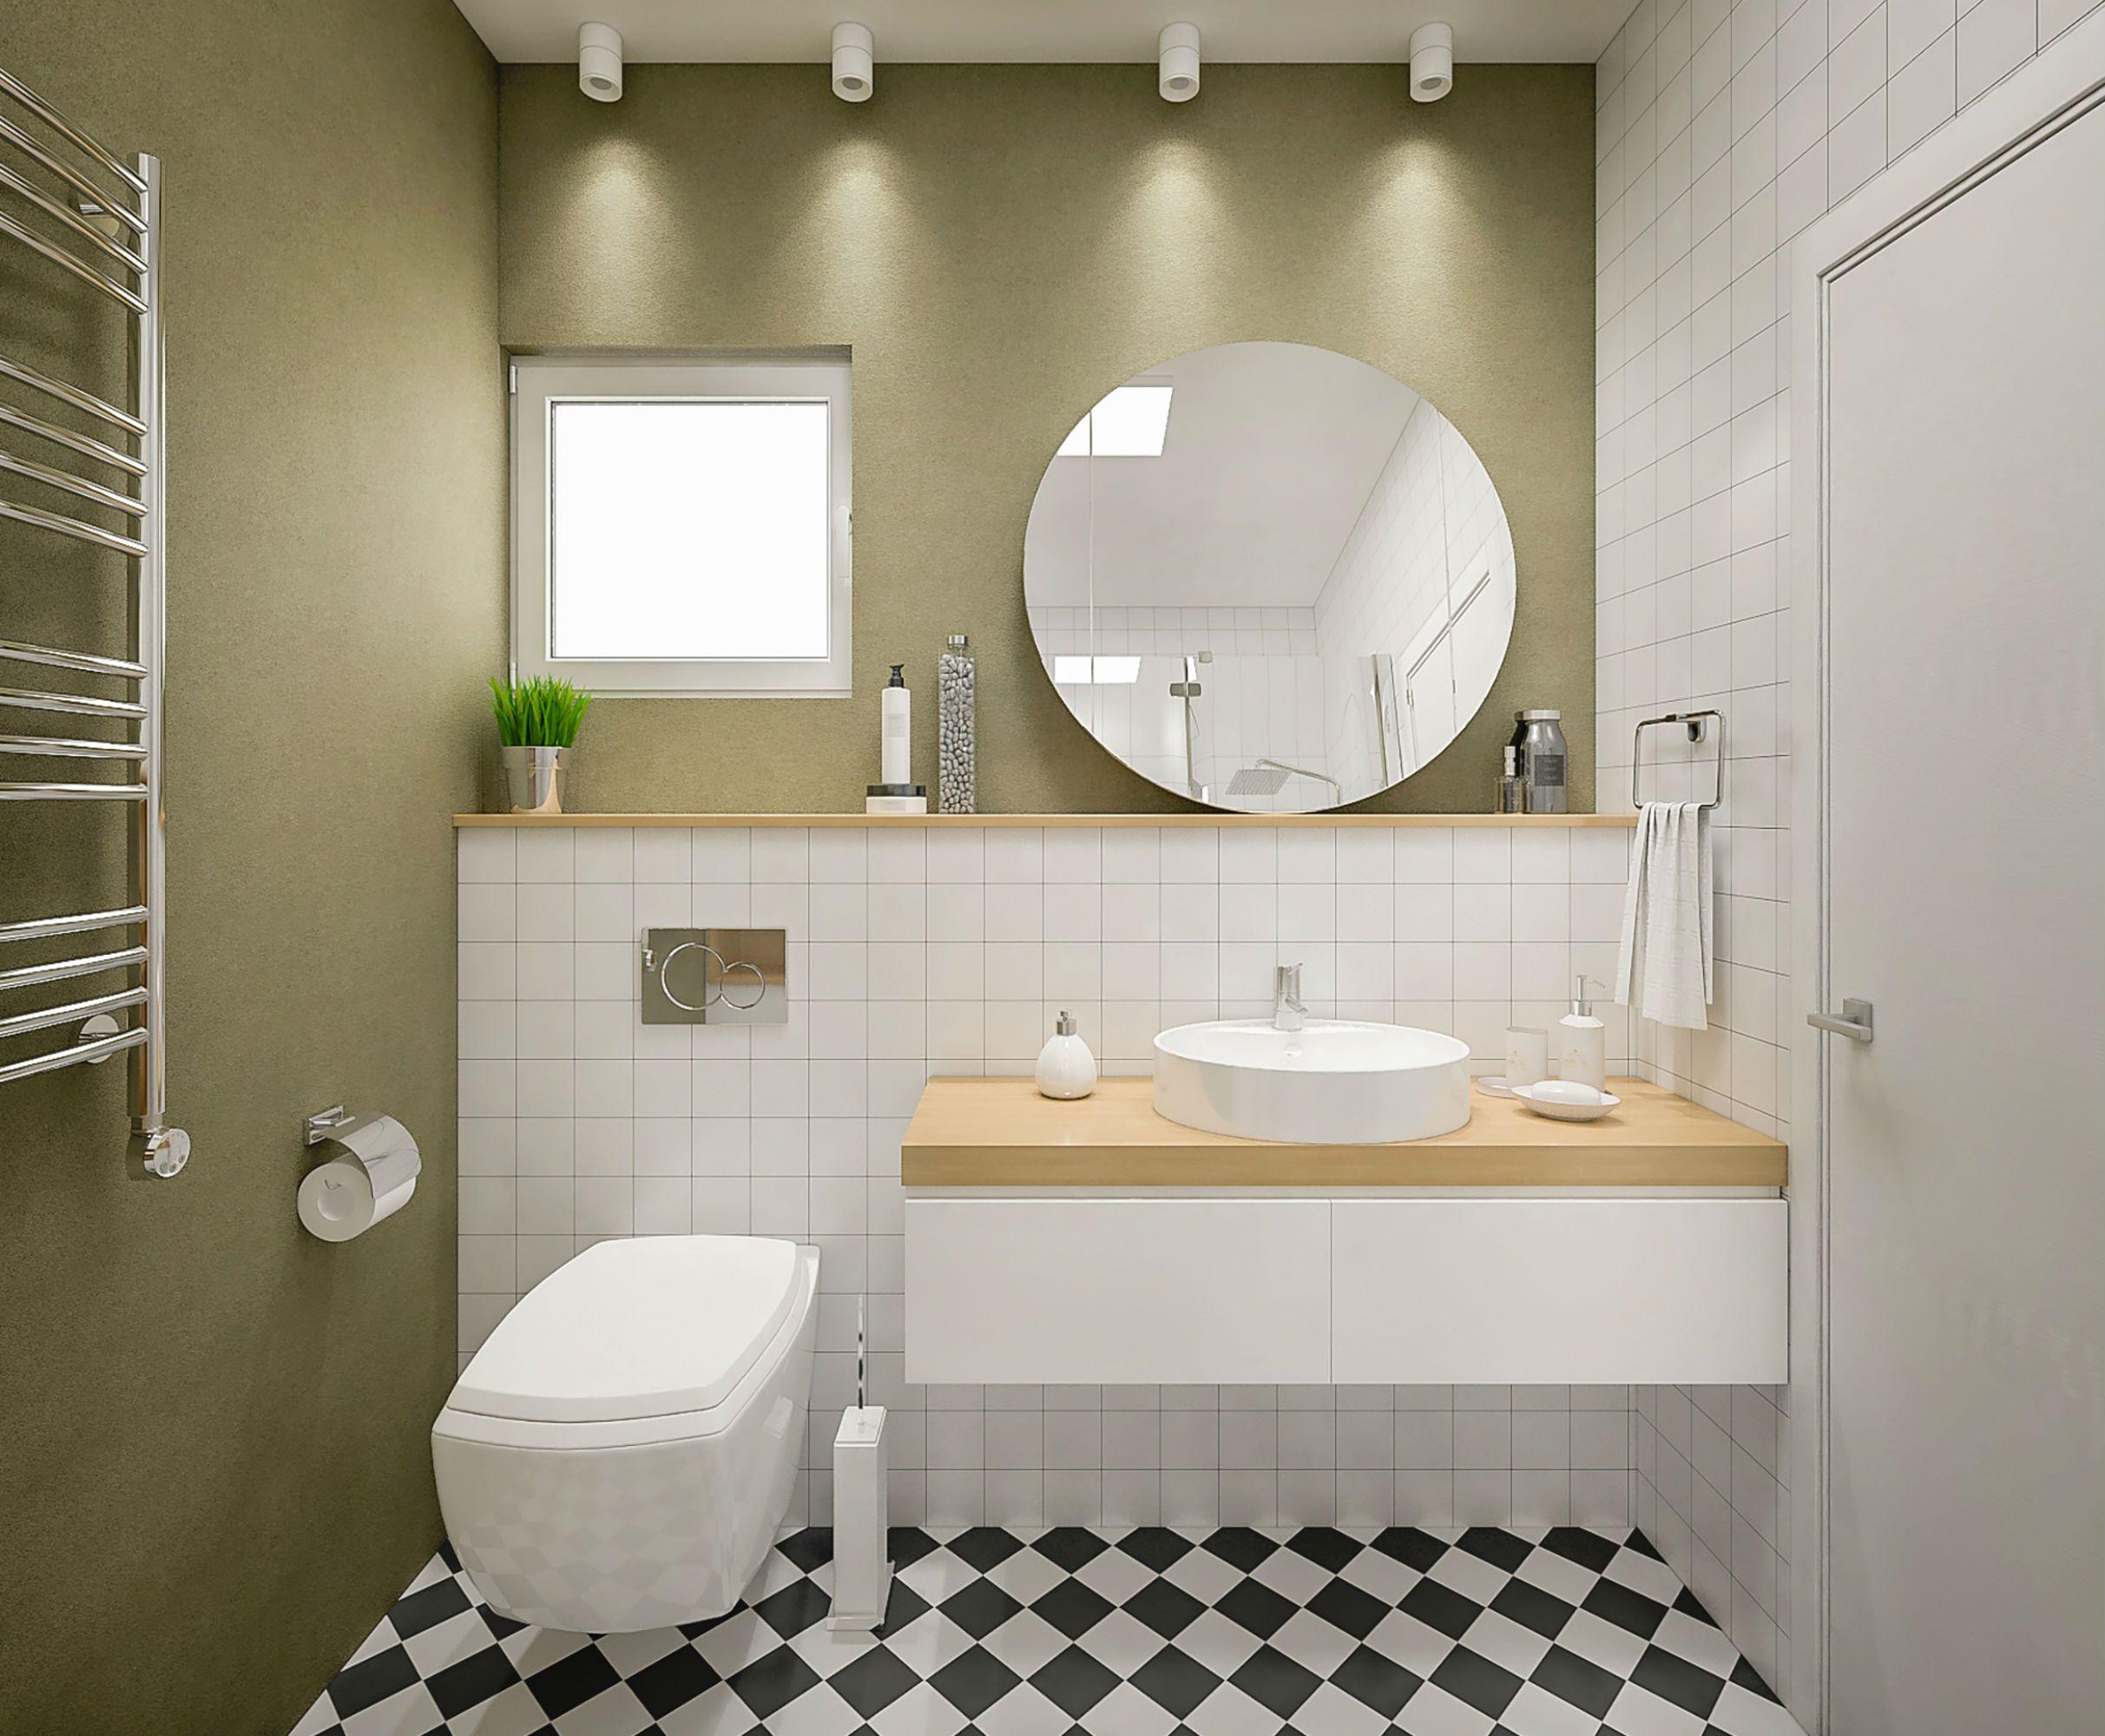 дизайн ванной комнаты фото 17